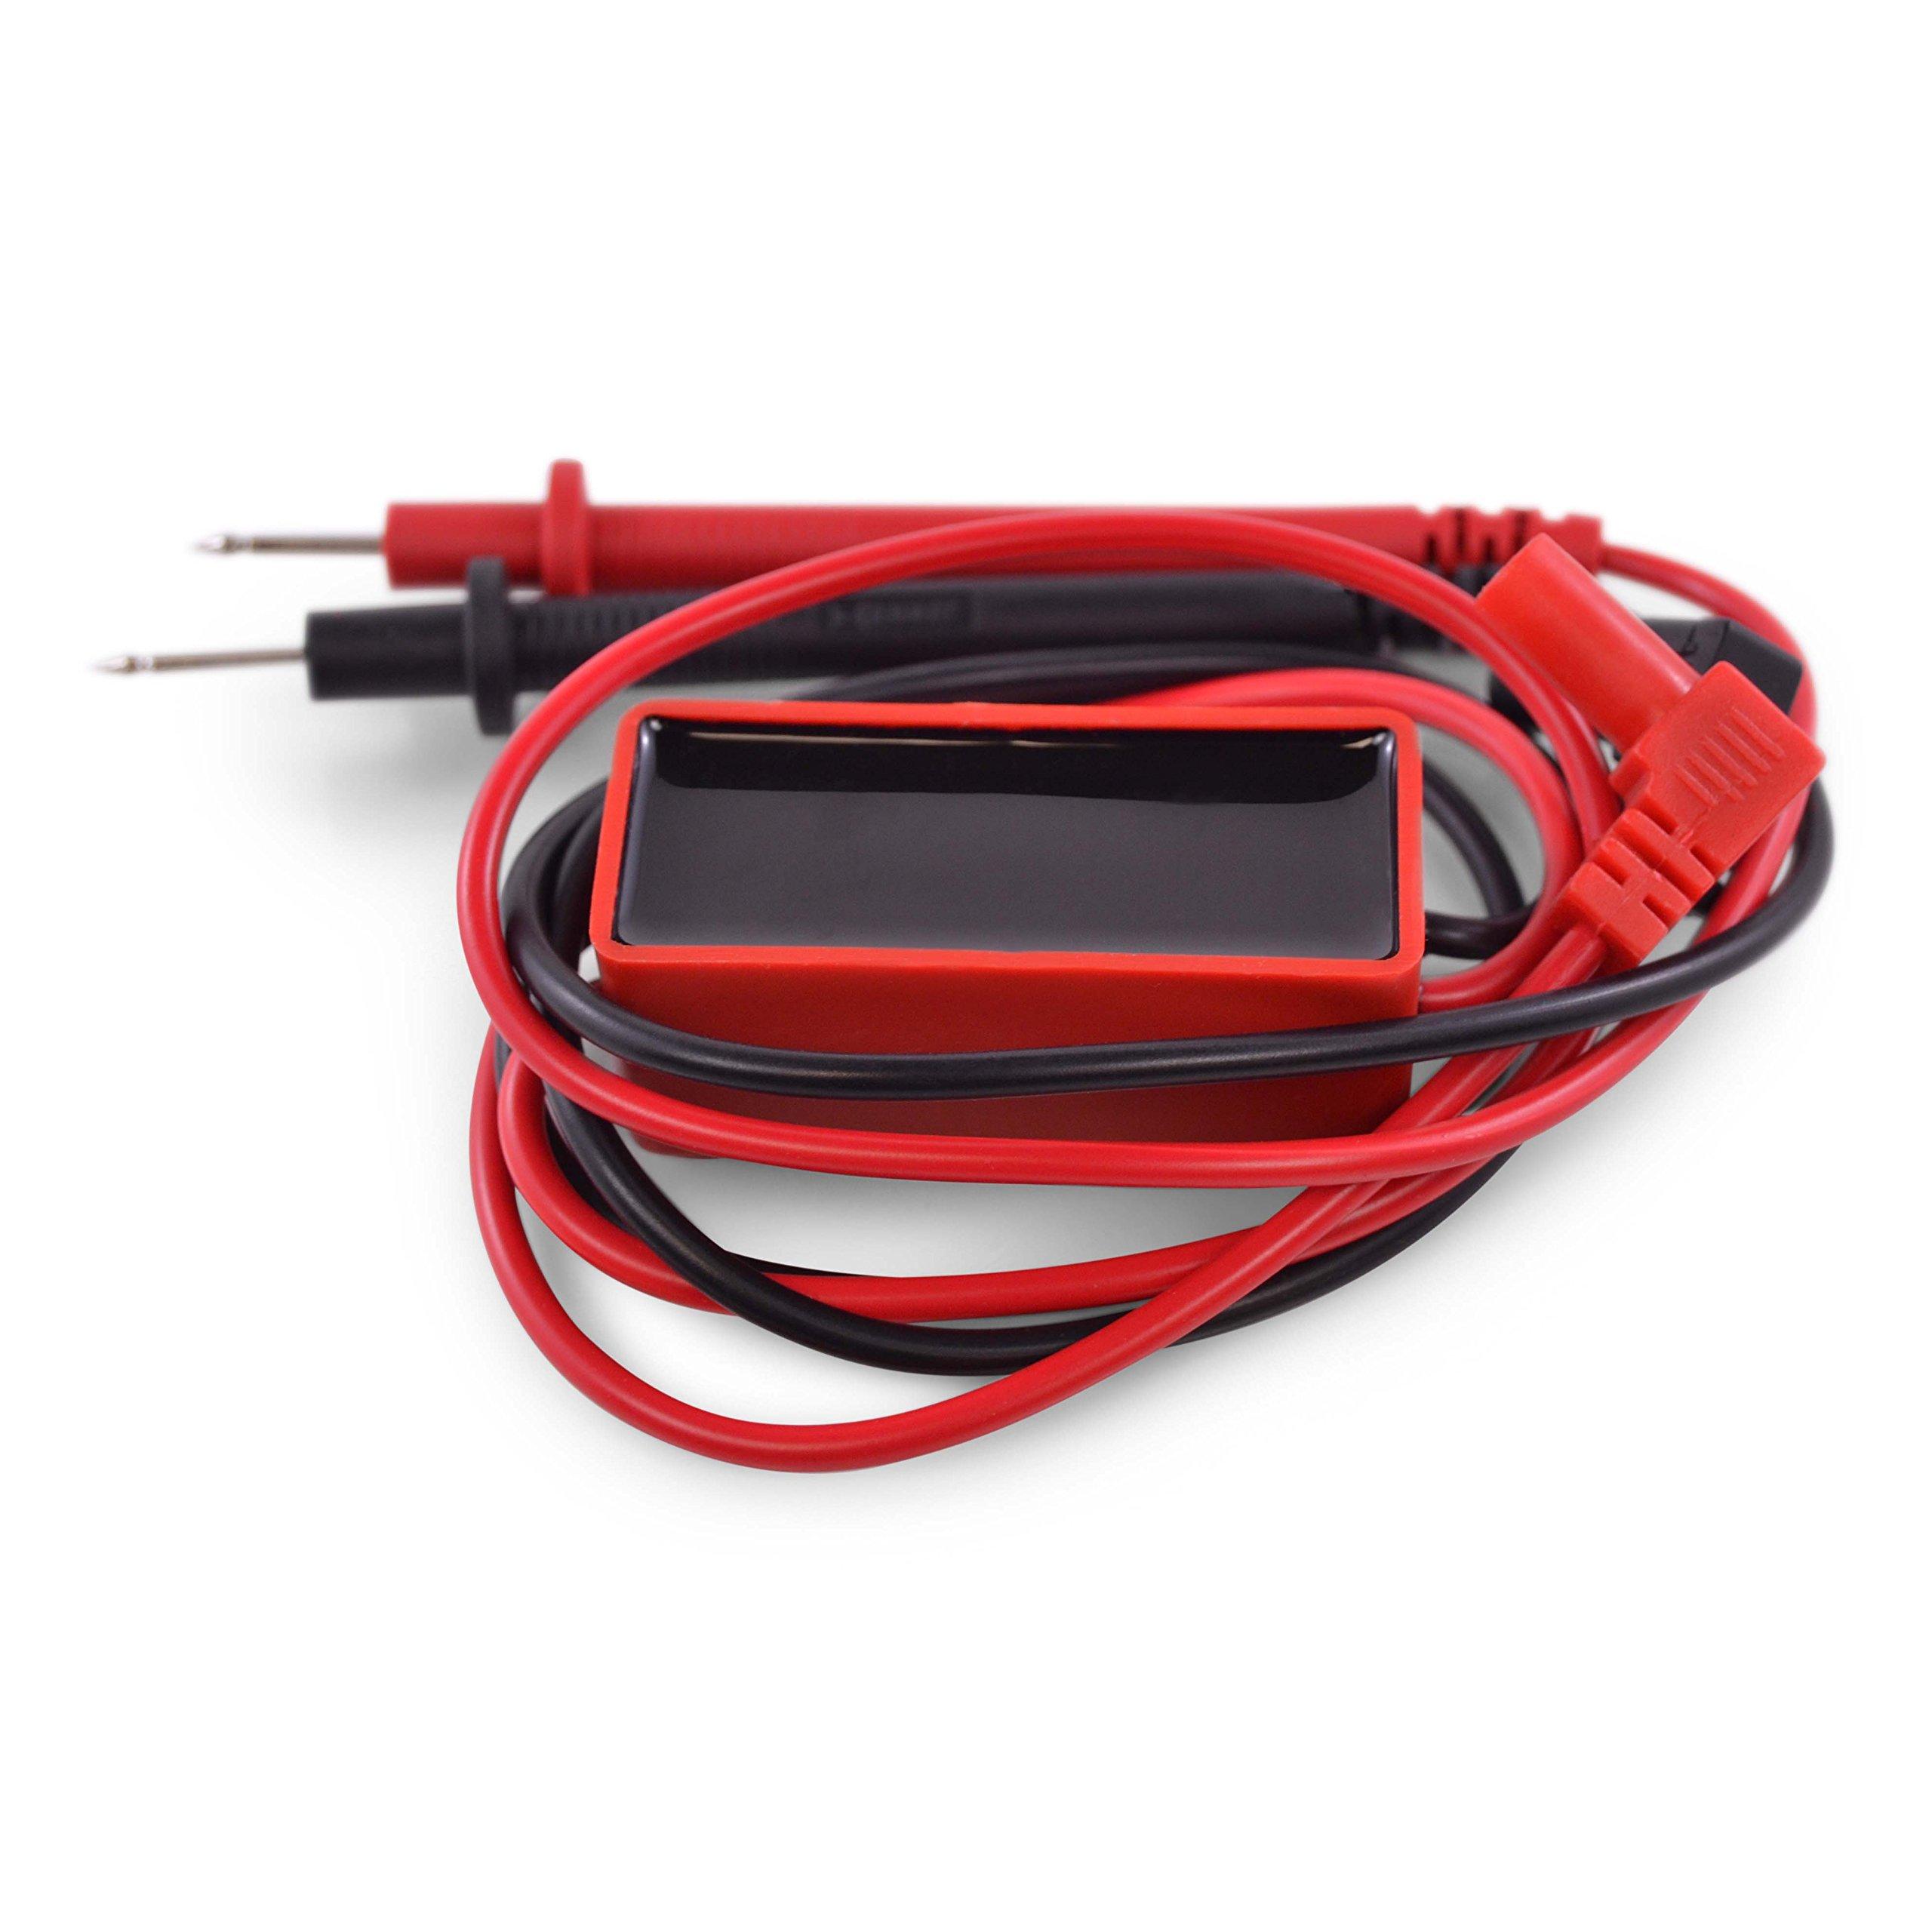 Voltage Peak Reading Adapter DVA Adapter For Multimeter Probes by RMSTATOR (Image #2)